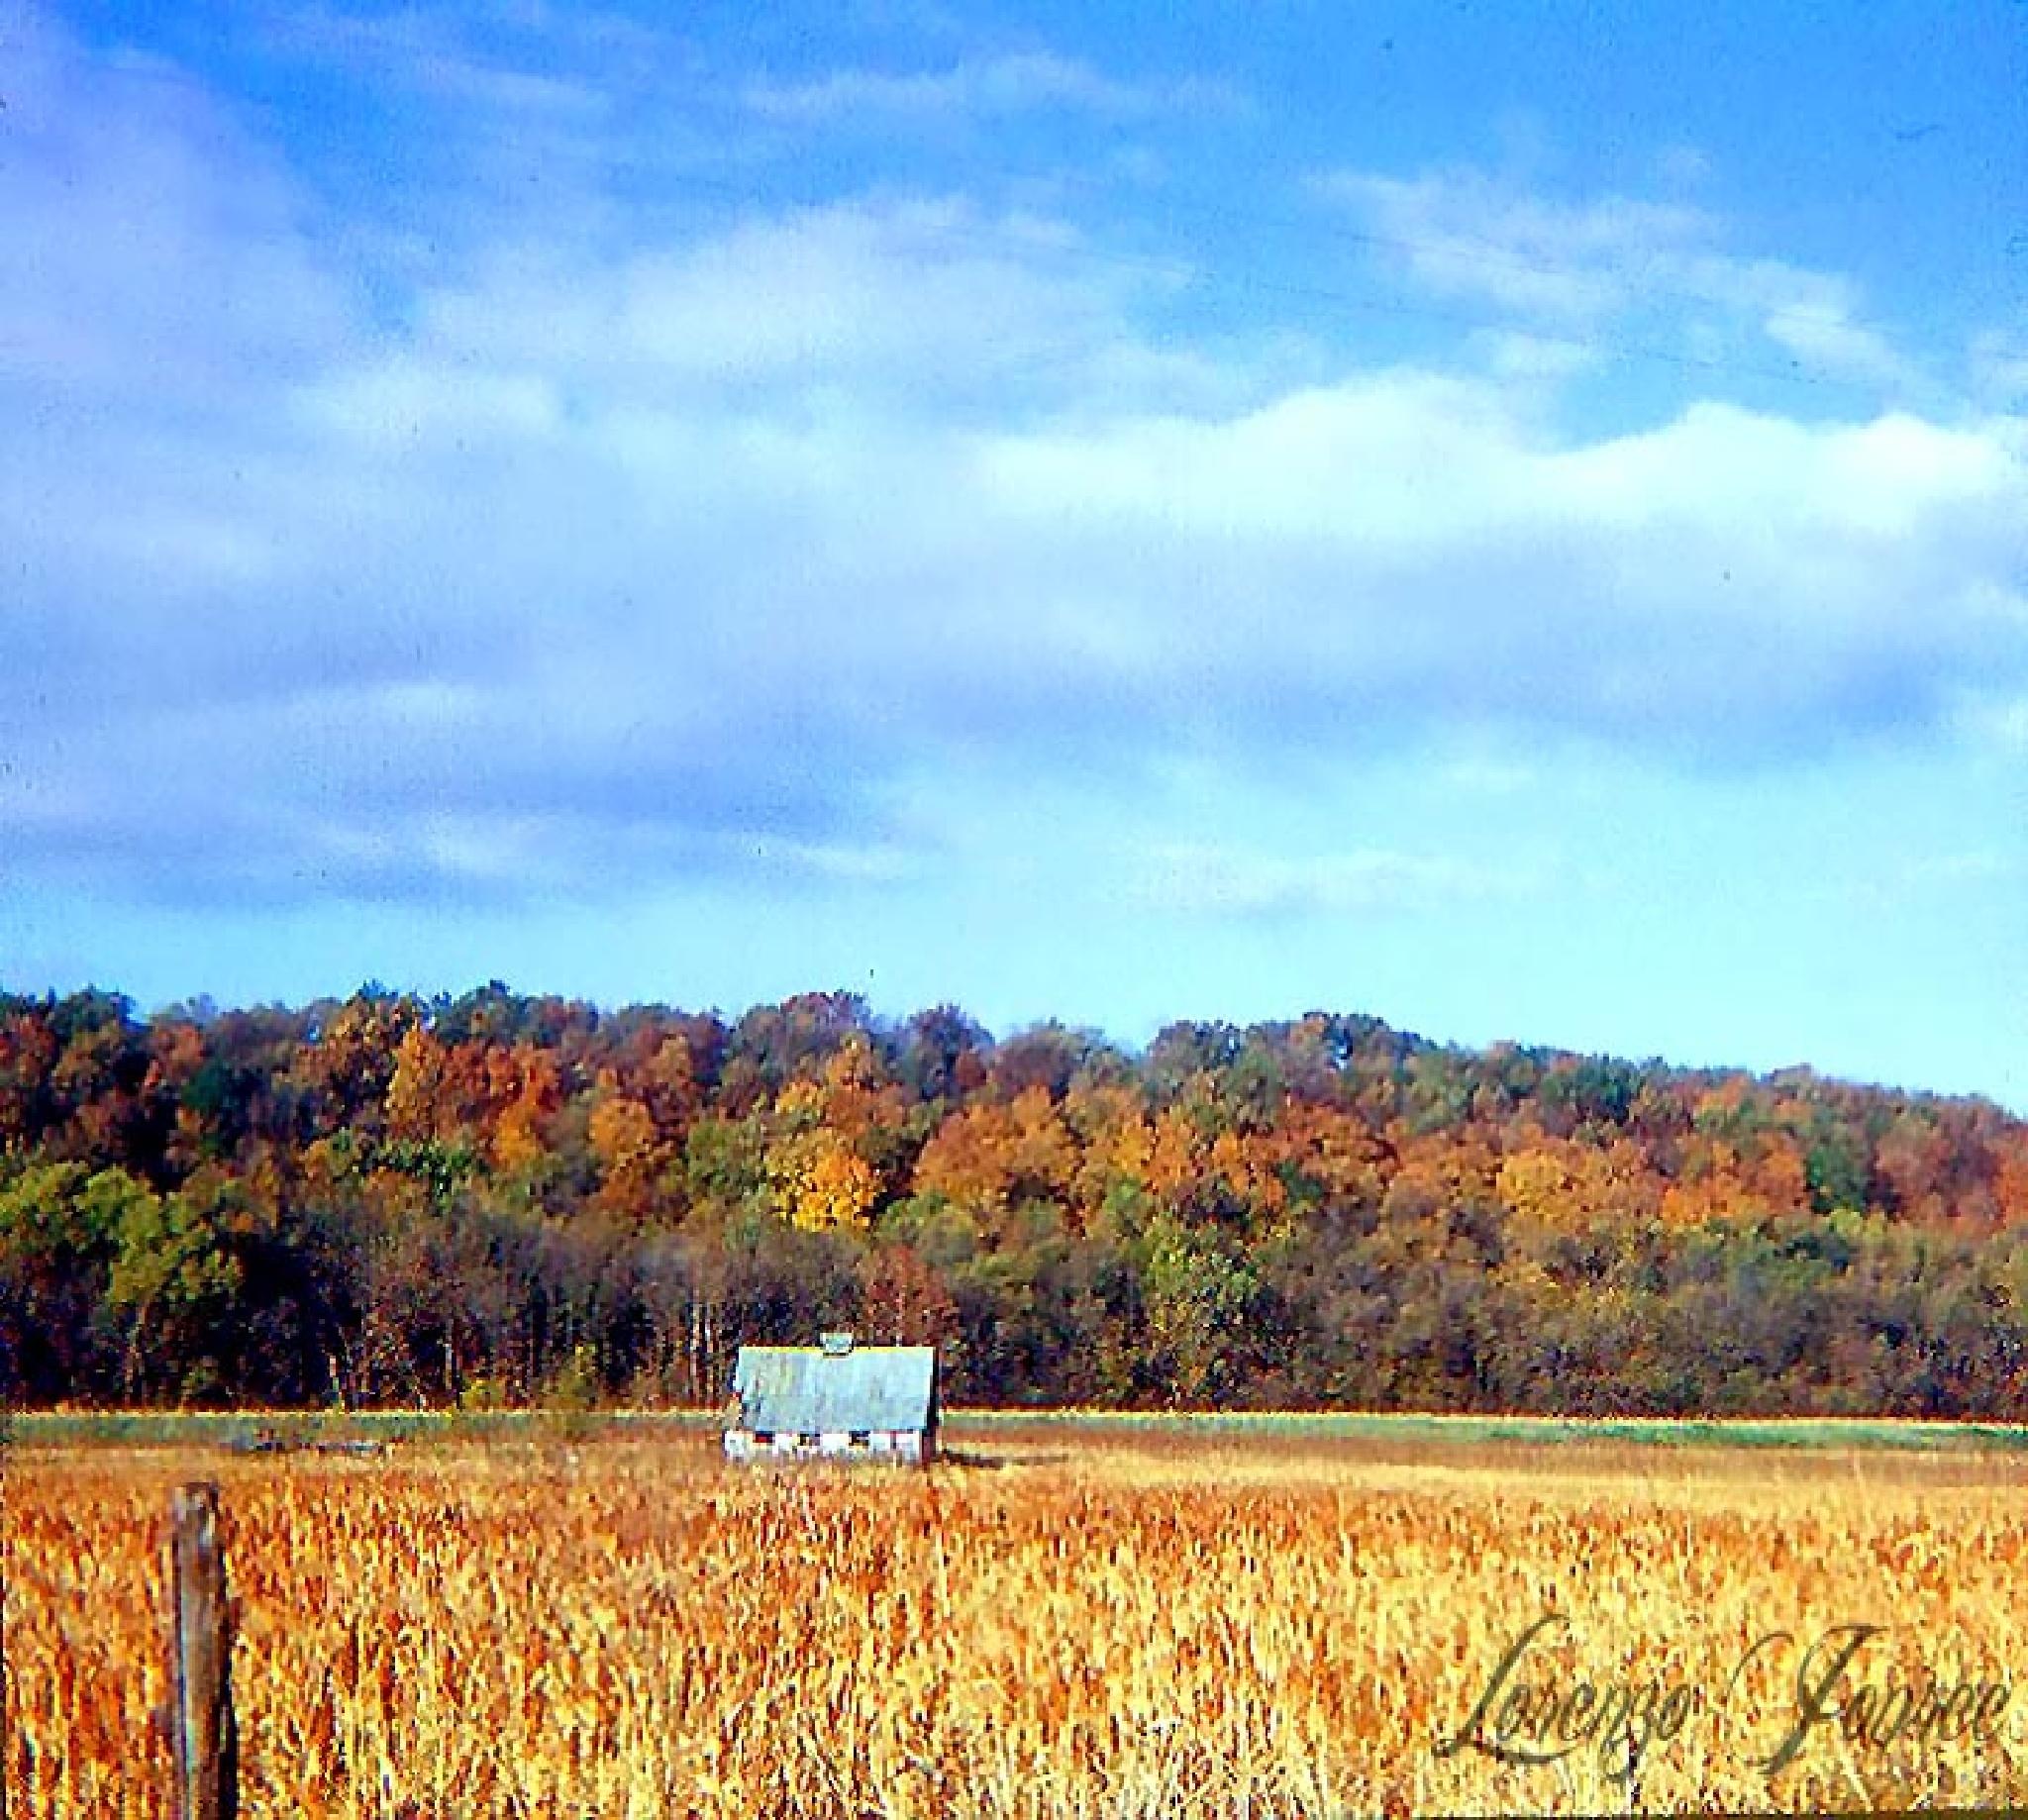 Rural Missouri In Autumn  by Lorenzo (Larry) Jonree